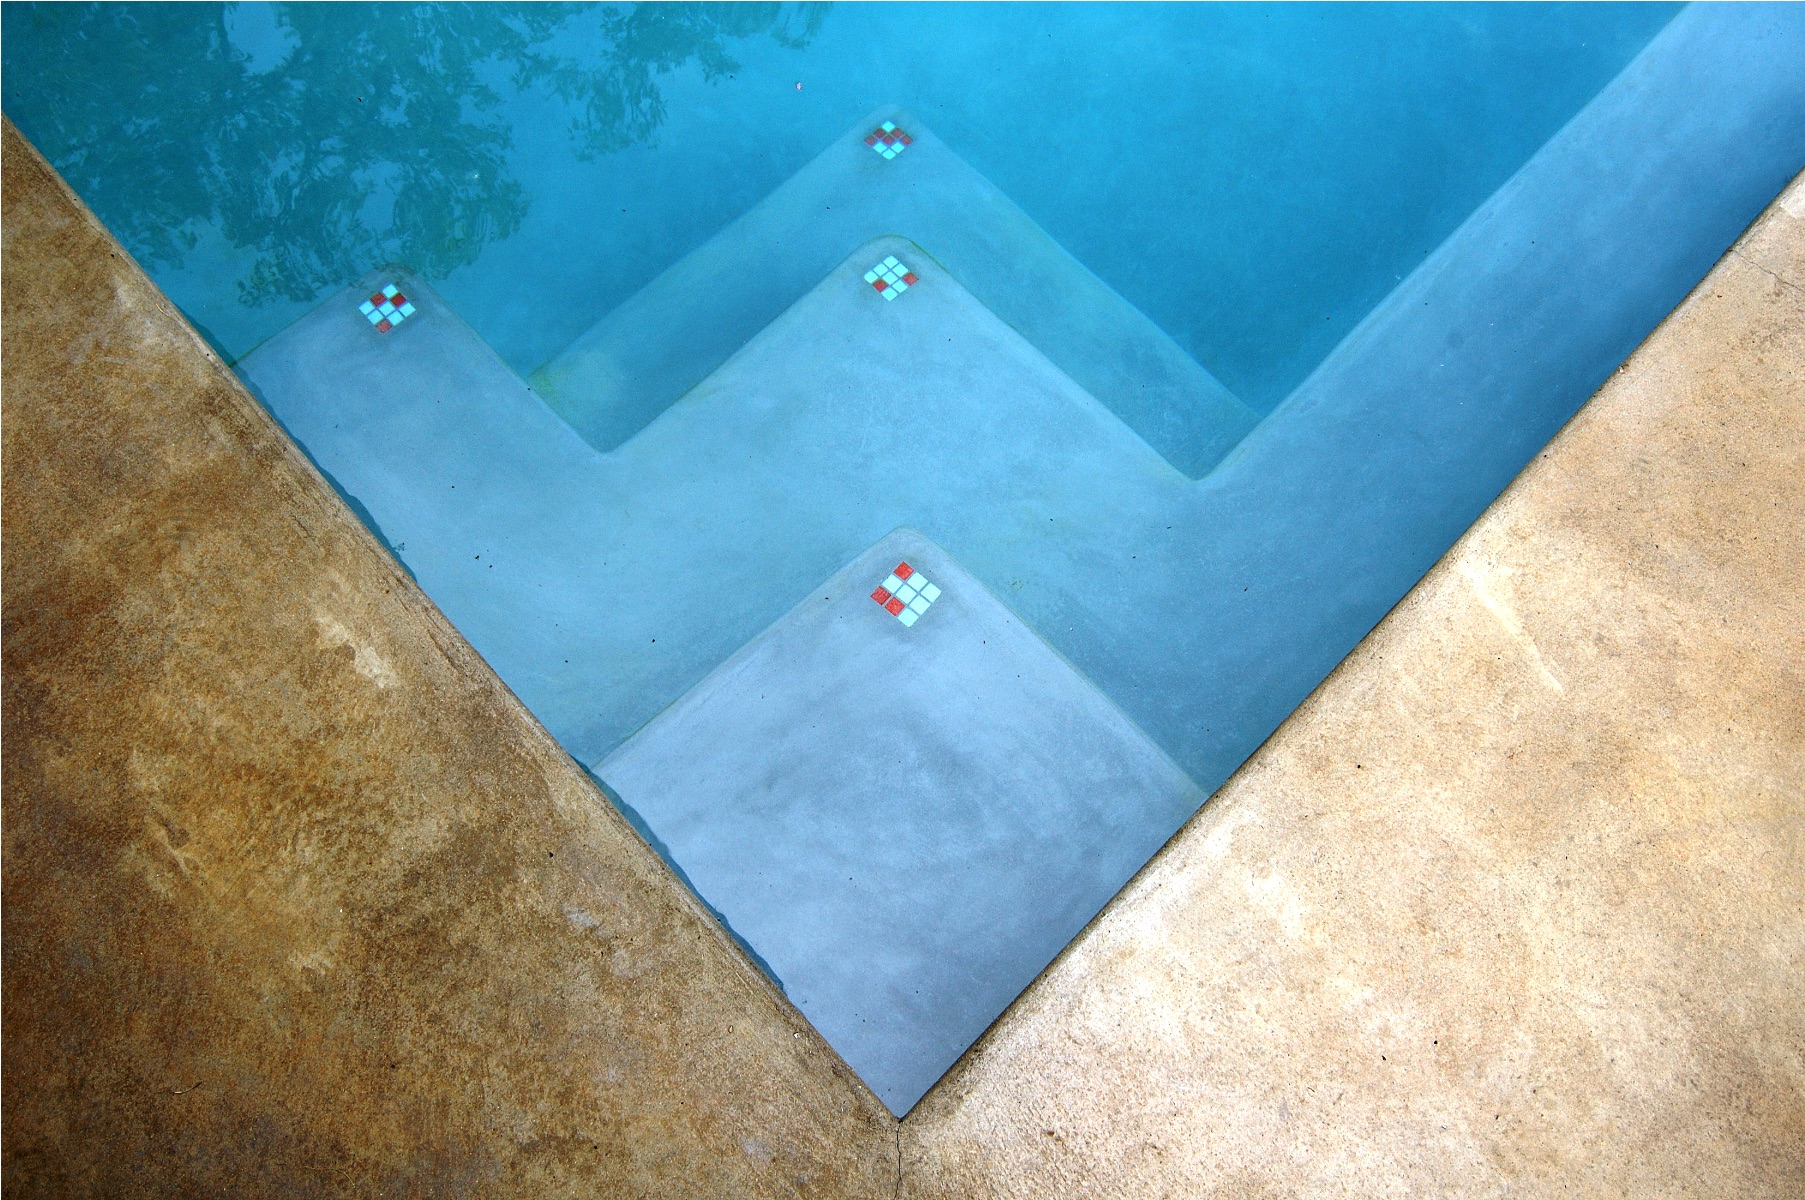 project-humphrey-place--pool-tiles-1600x1200.jpg